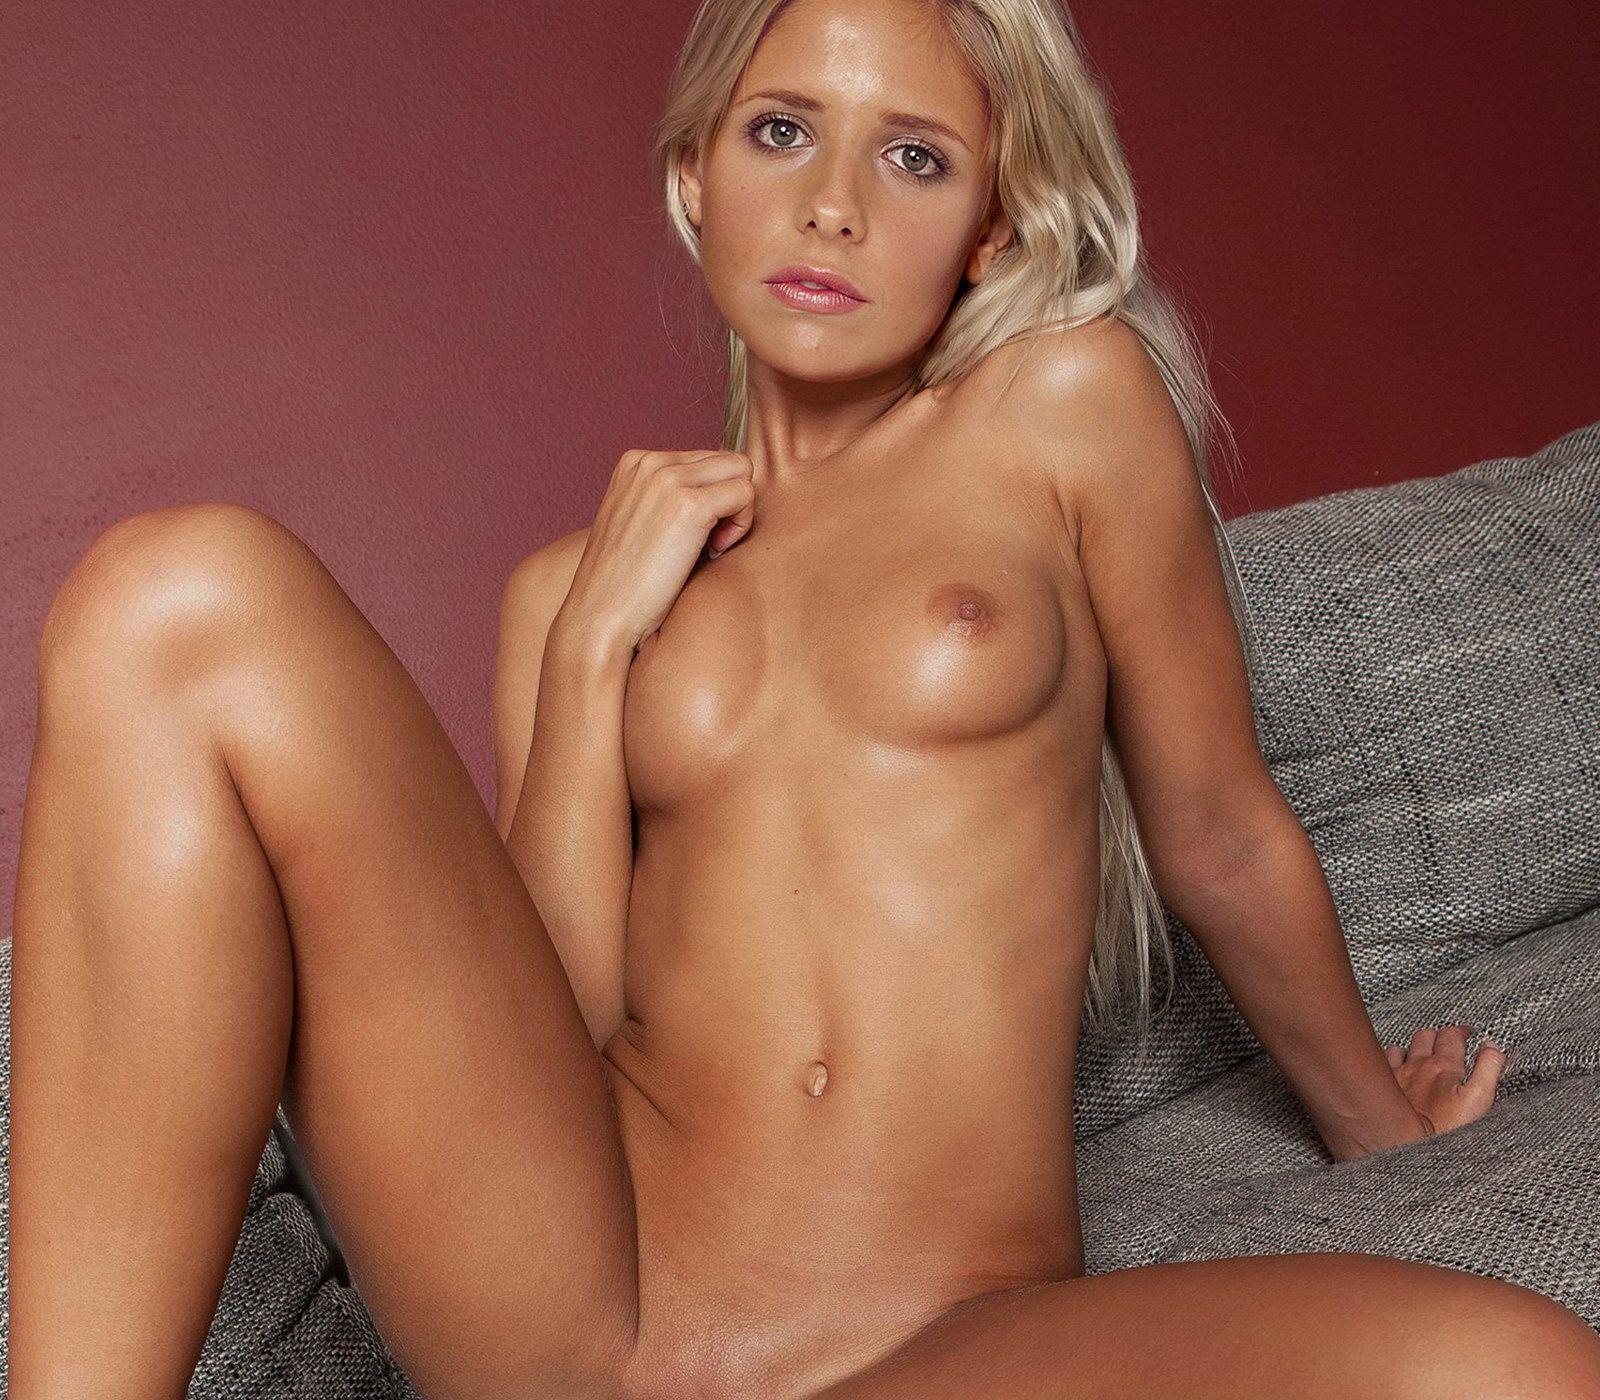 Sarah Michelle Gellar Nude